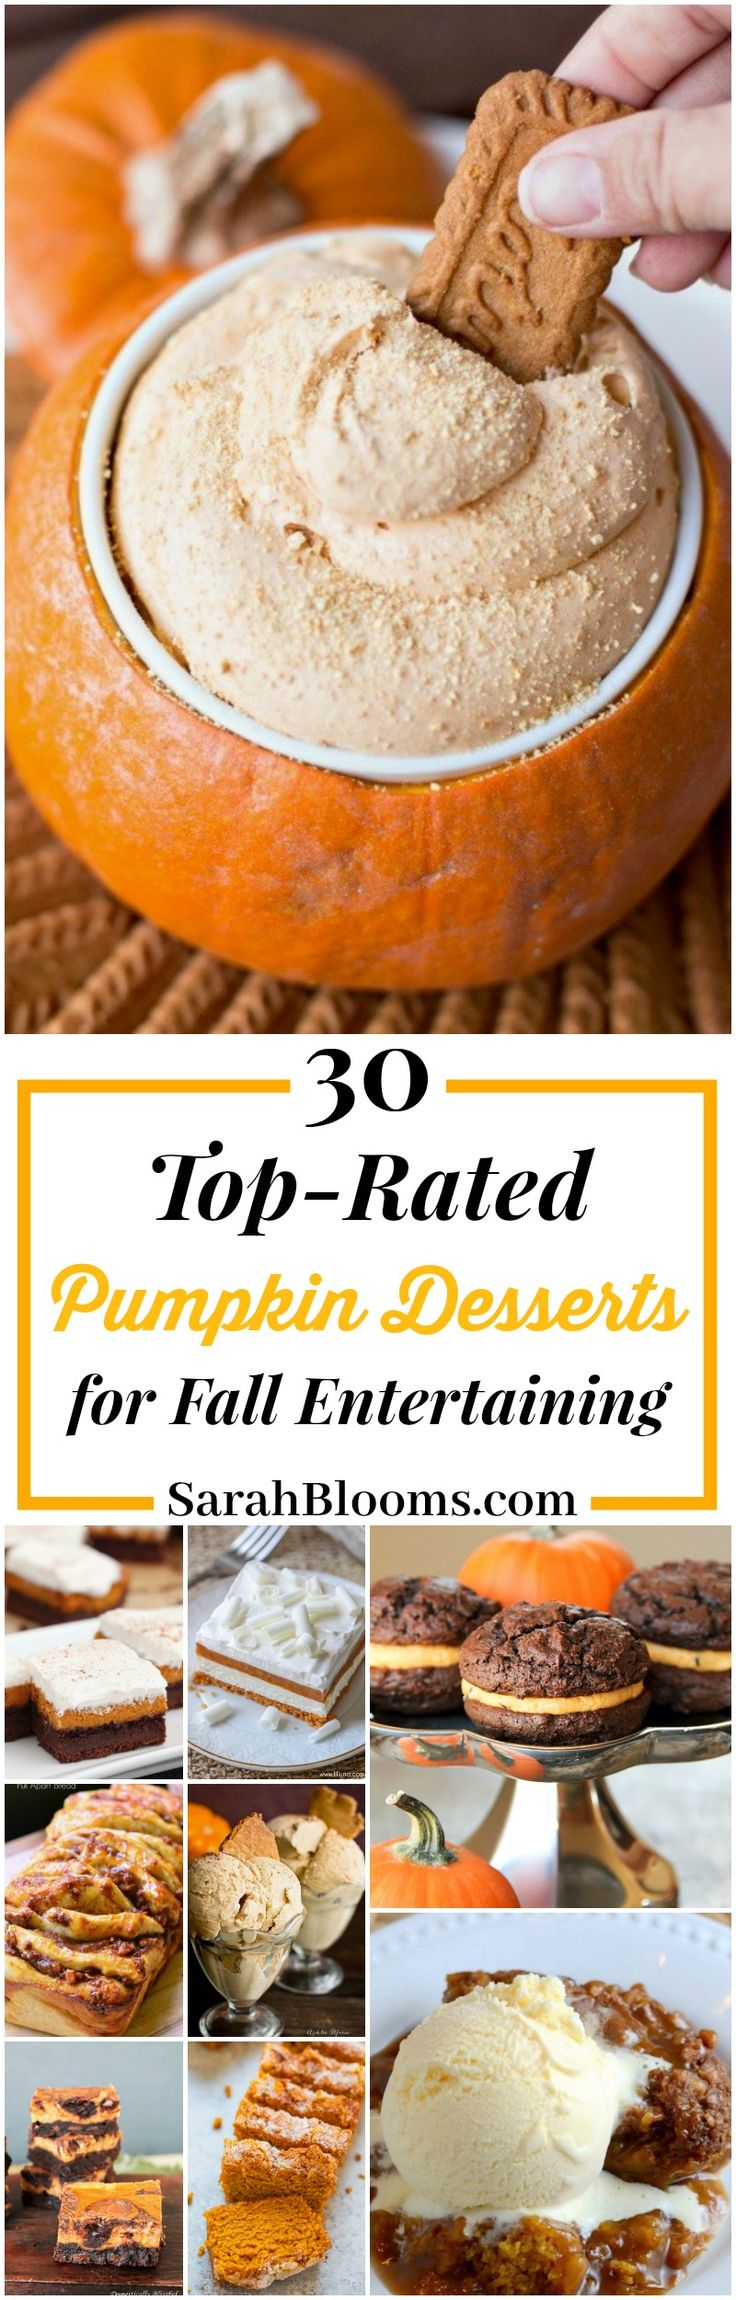 30 Top-Rated Pumpkin Desserts